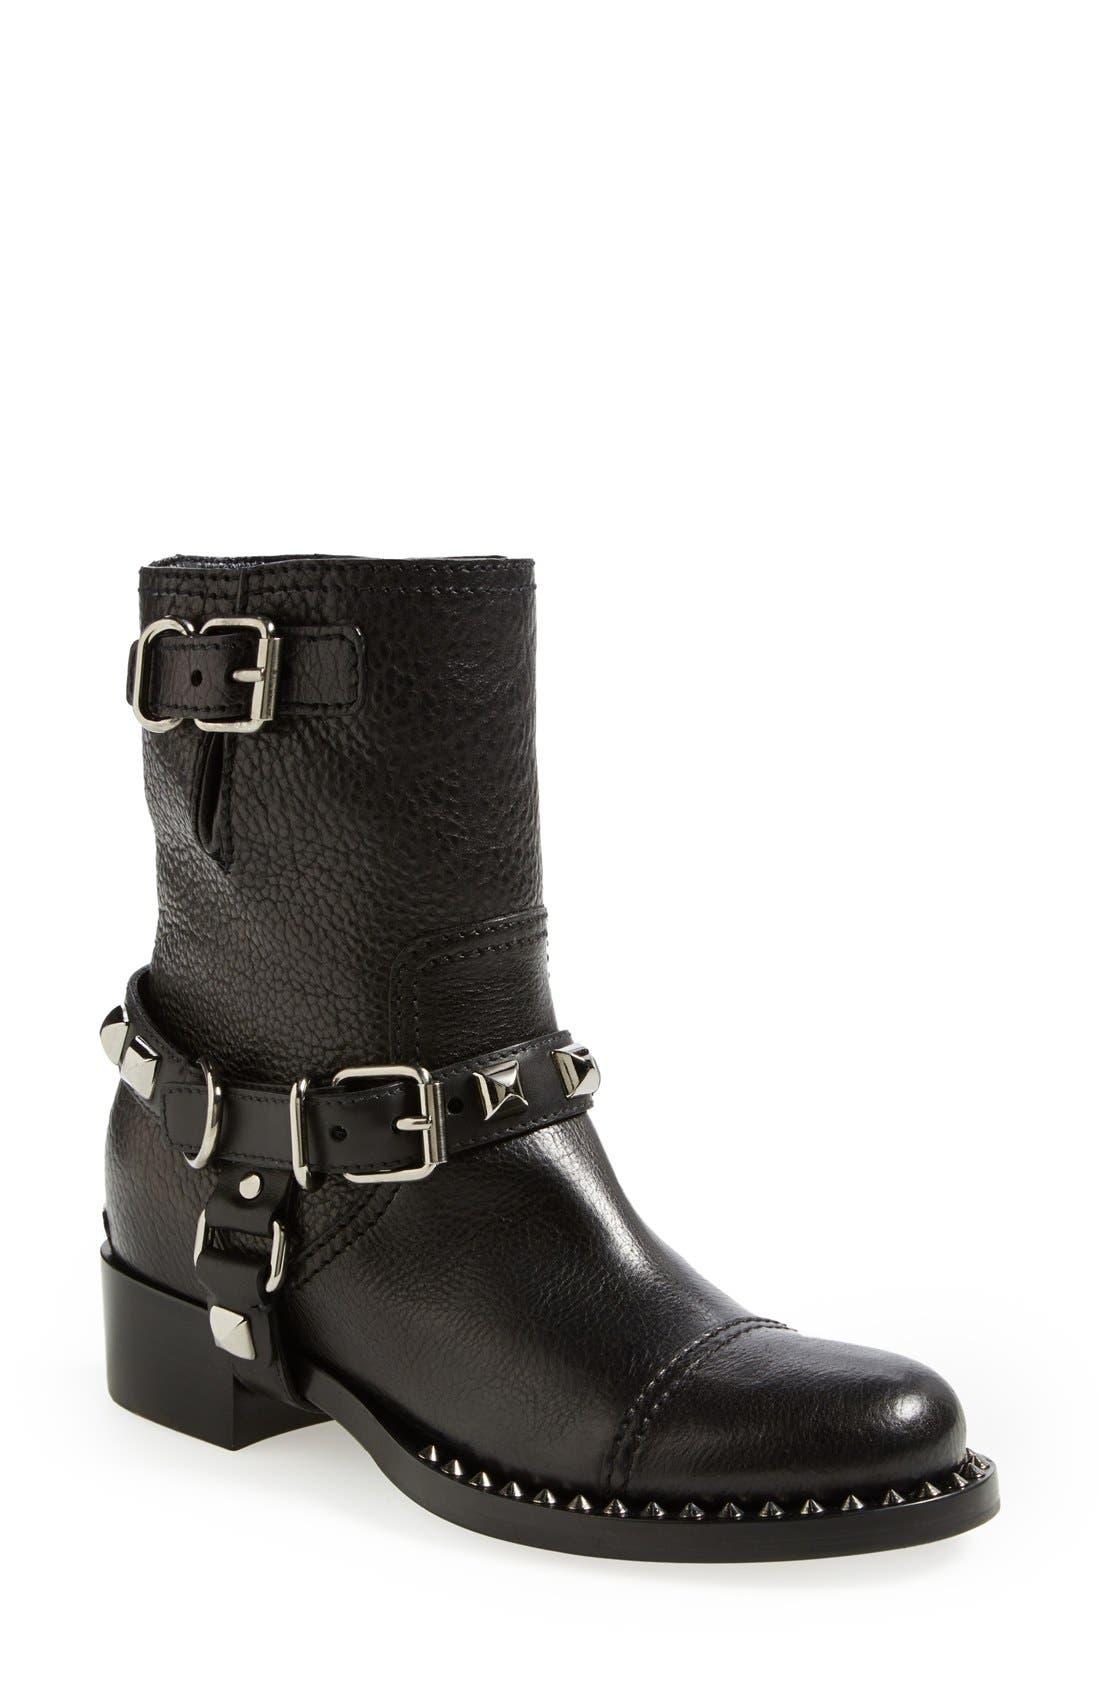 Alternate Image 1 Selected - Miu Miu Studded Harness Moto Boot (Women)